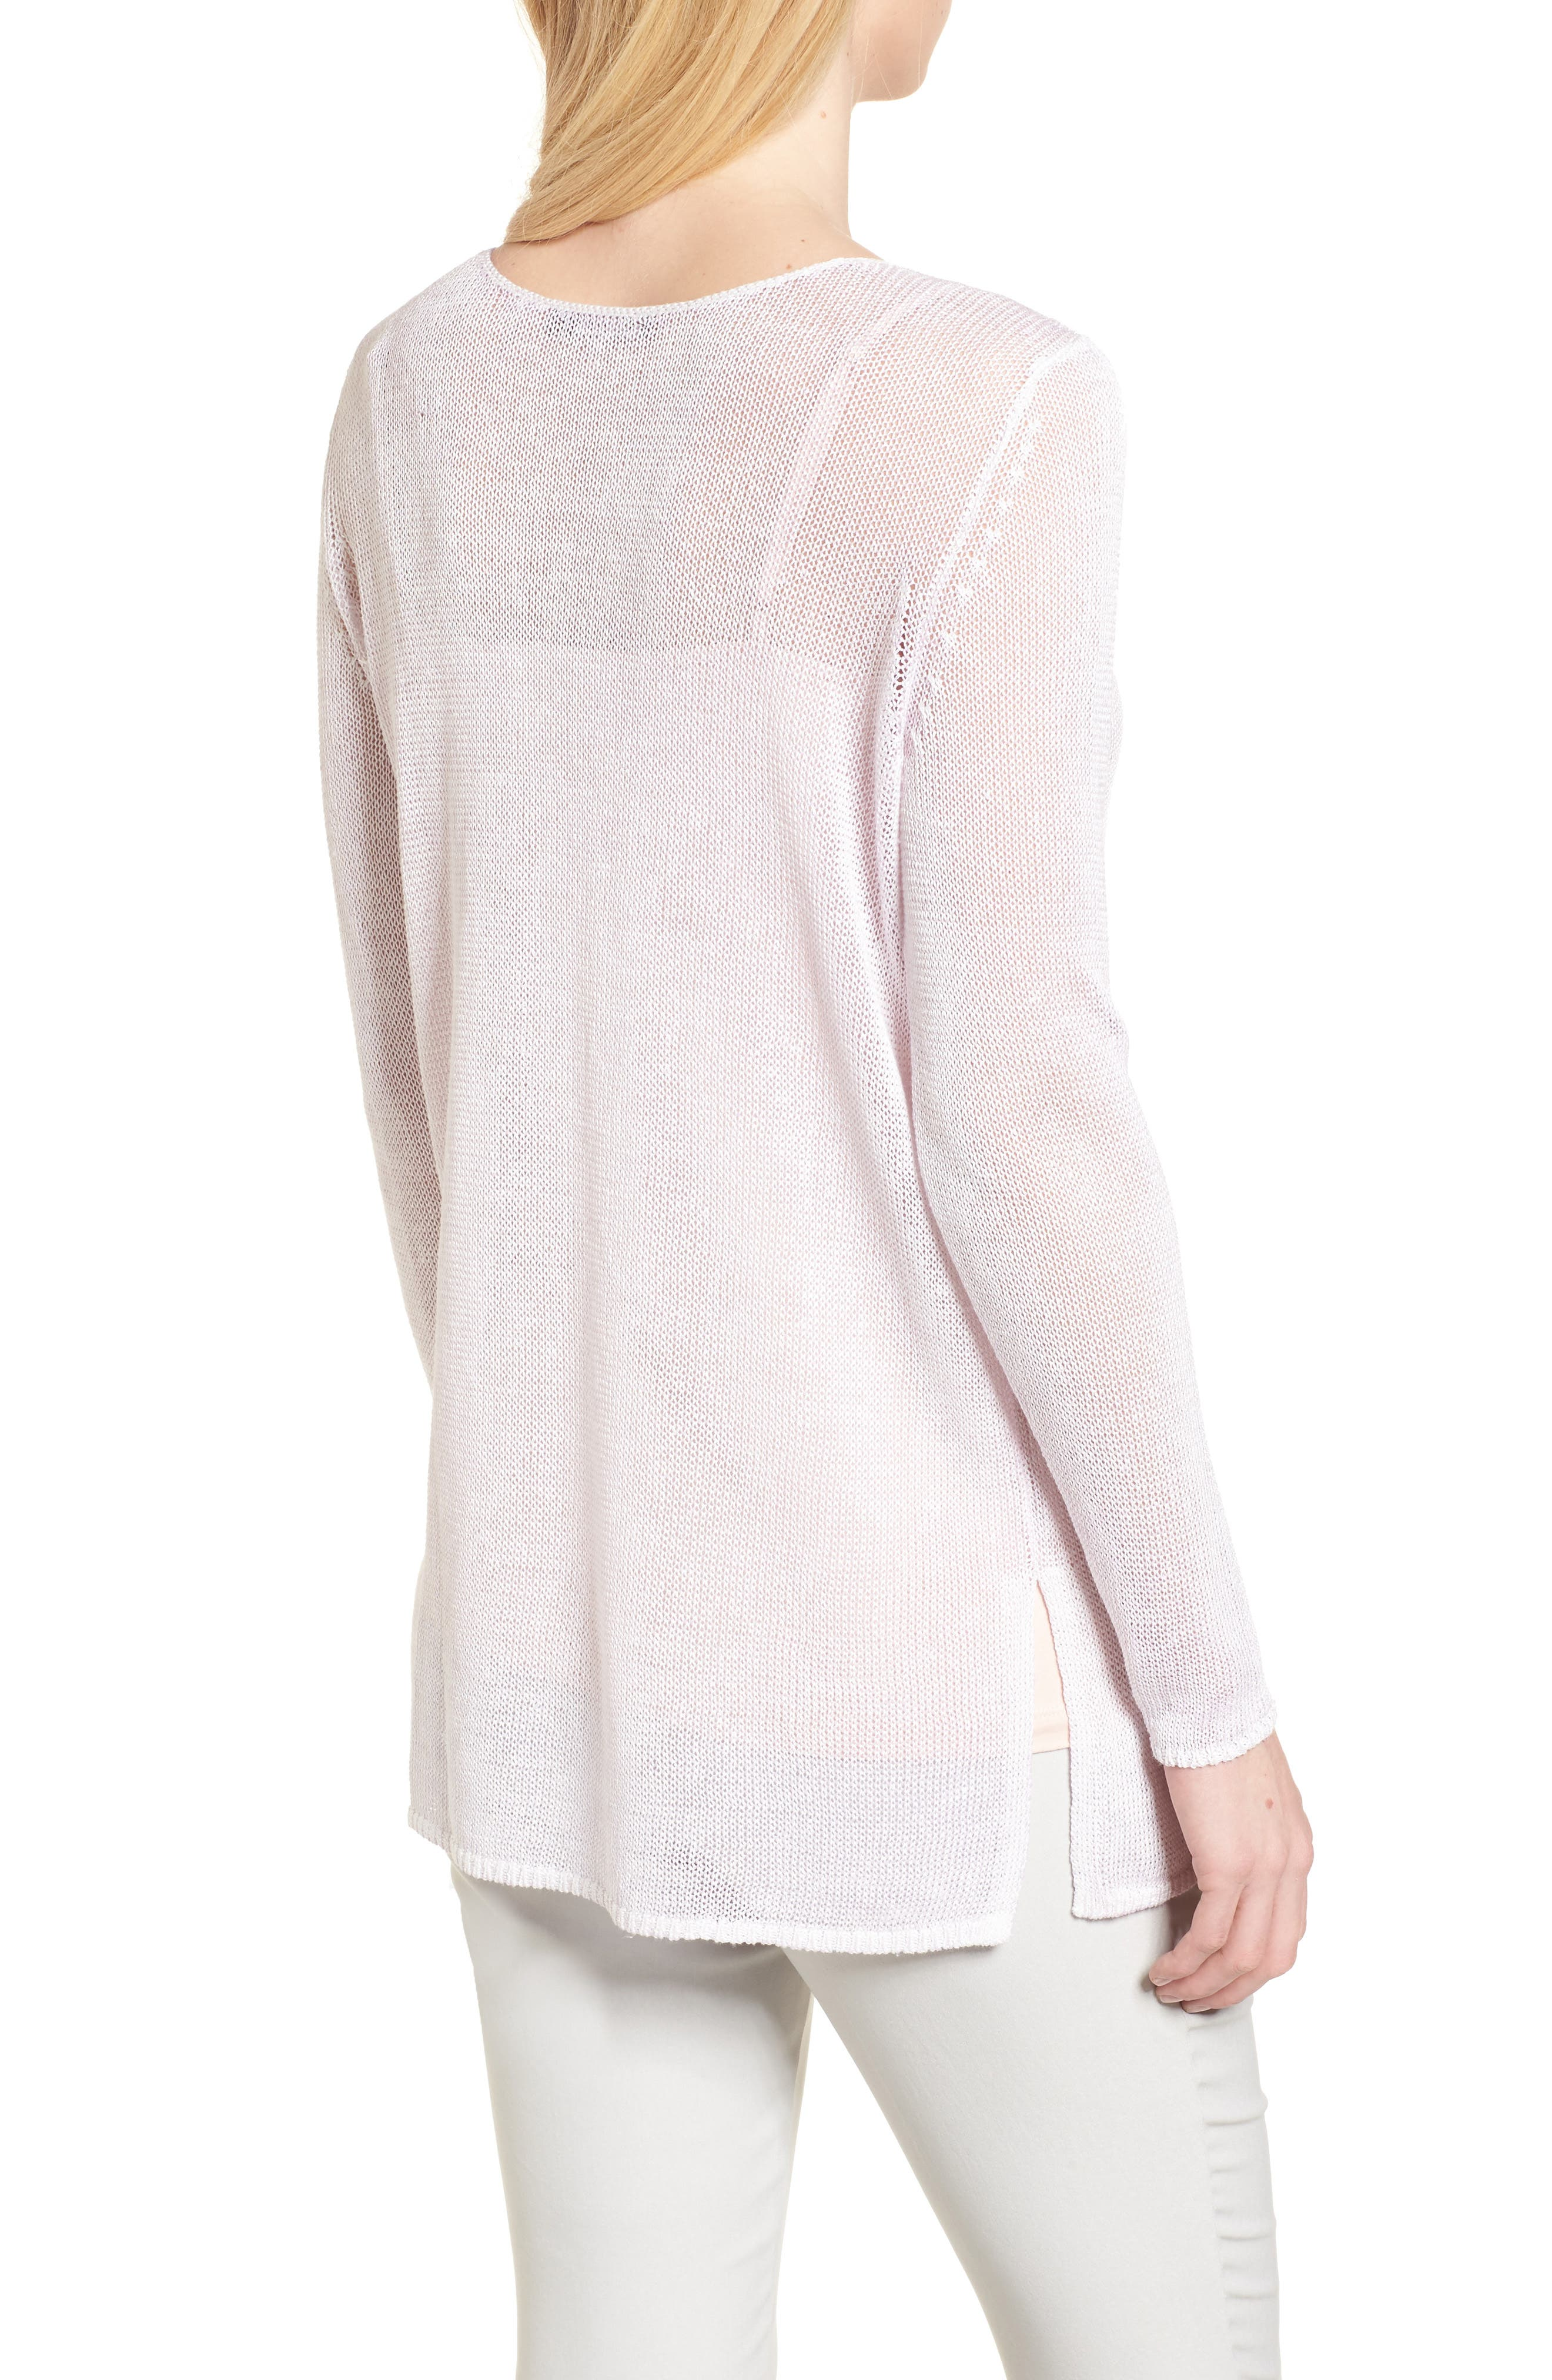 NIC + ZOE Poolside Linen Blend Sweater,                             Alternate thumbnail 2, color,                             Tea Dust